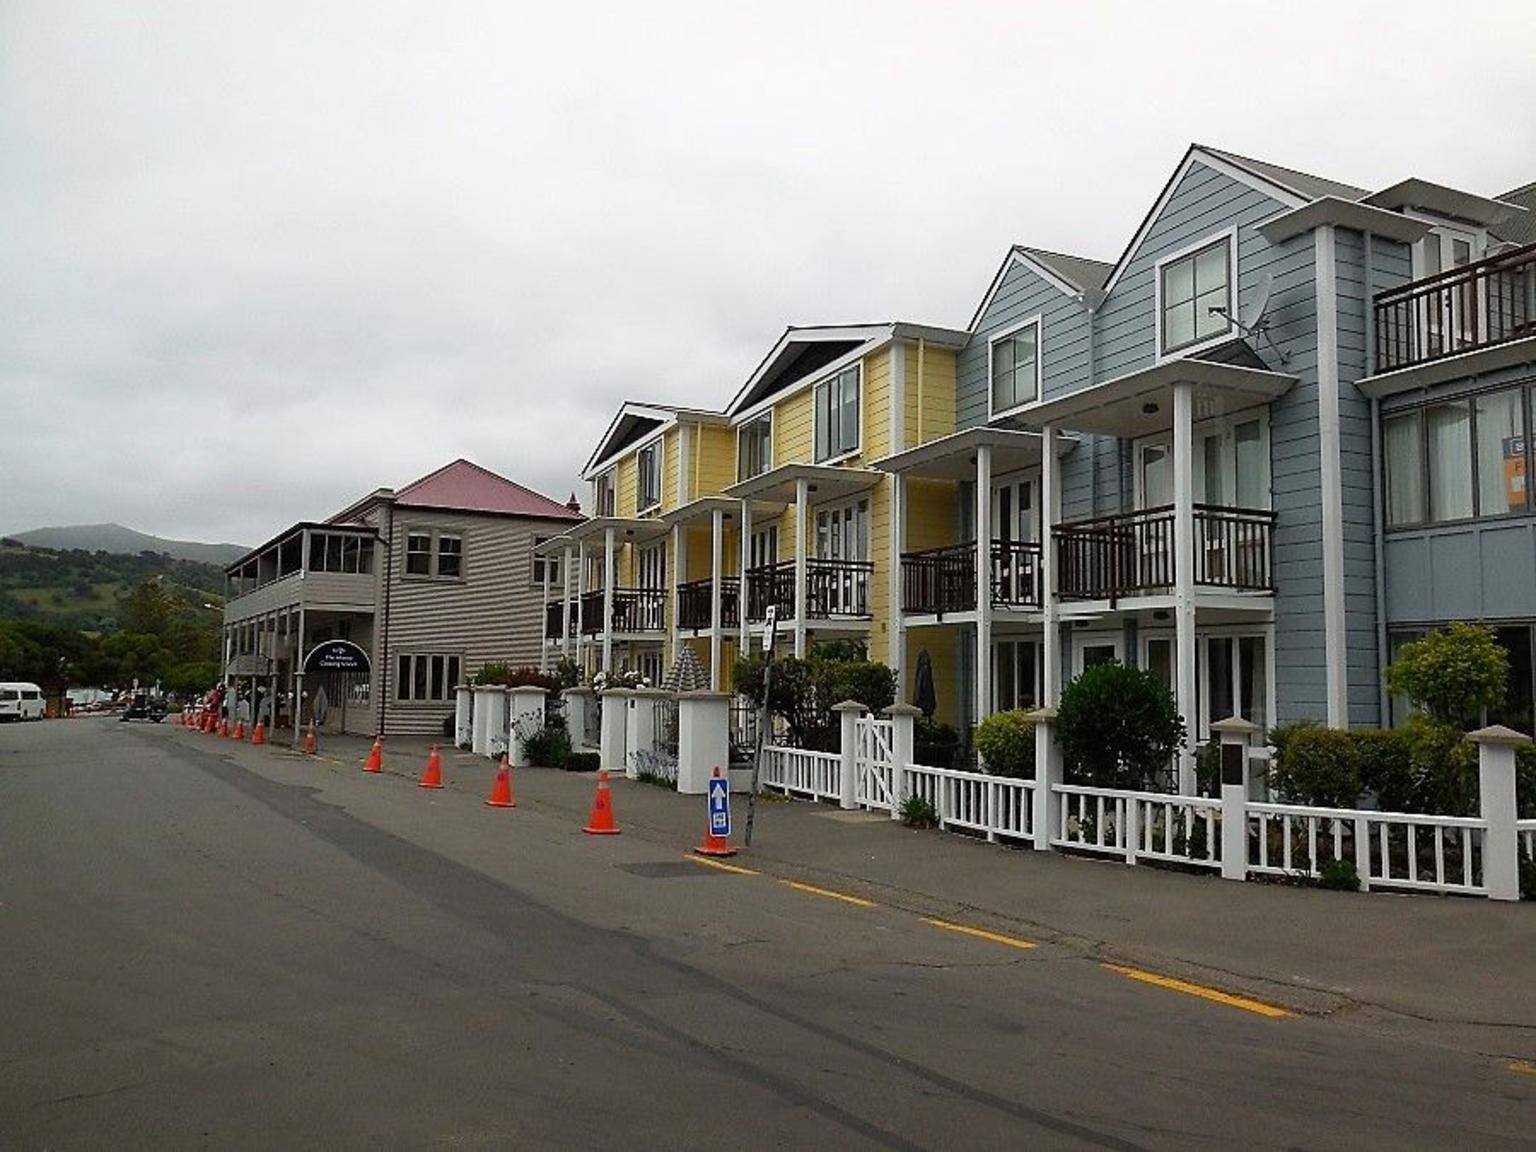 MÁS FOTOS, Akaroa Shore Excursion: Banks Peninsula, Christchurch City Tour and the International Antarctic Centre